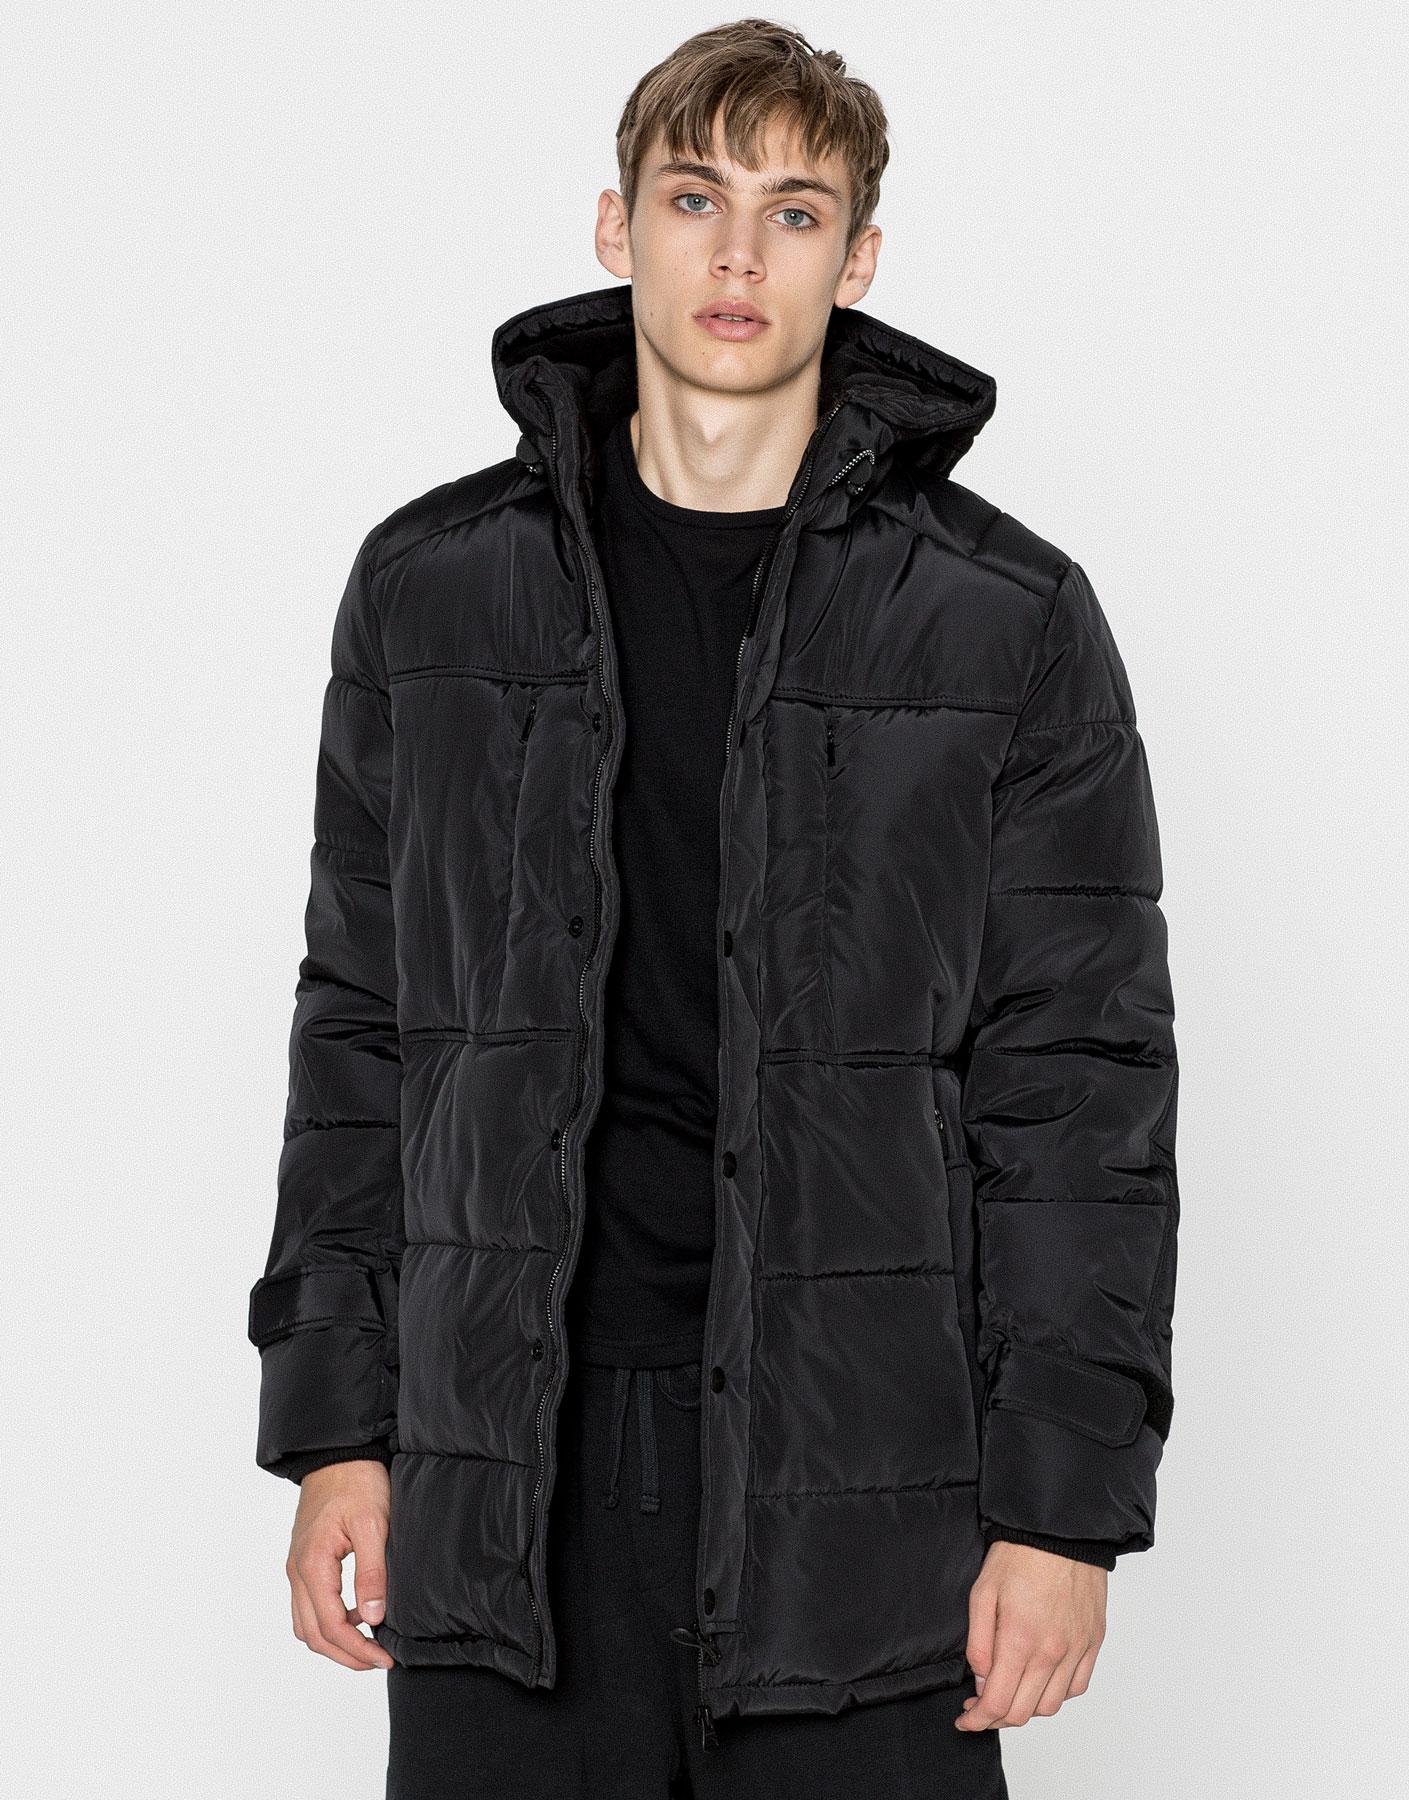 men 39 s coats and jackets winter sale pull bear. Black Bedroom Furniture Sets. Home Design Ideas